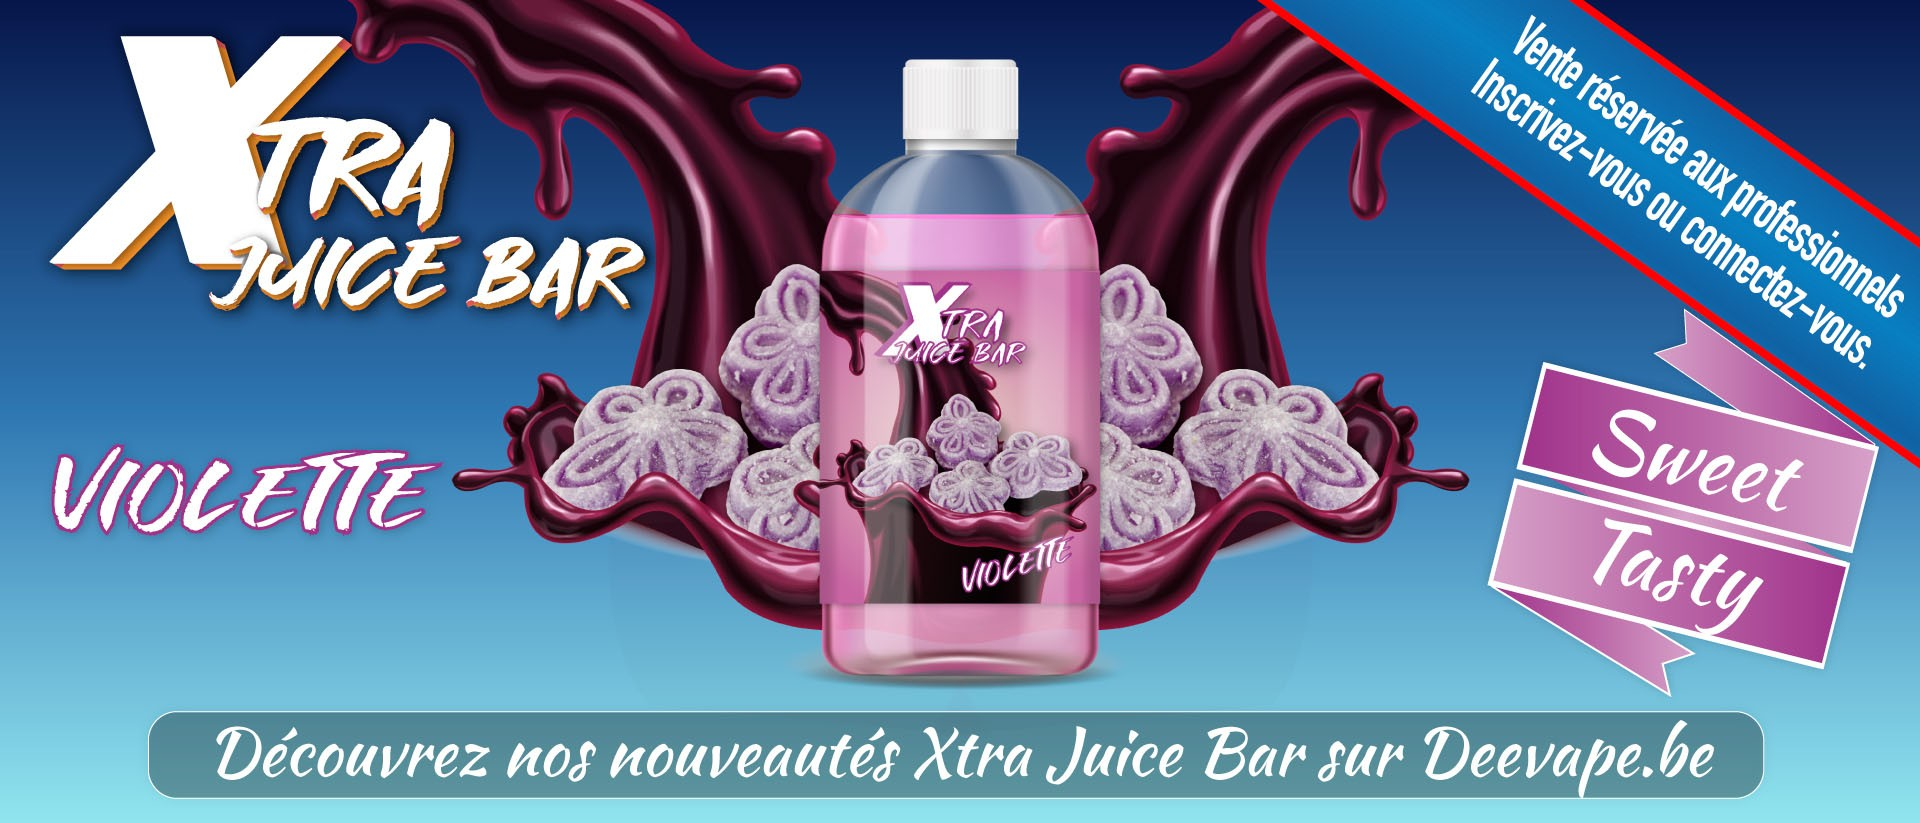 XTRA JUICE BAR - VIOLETTE